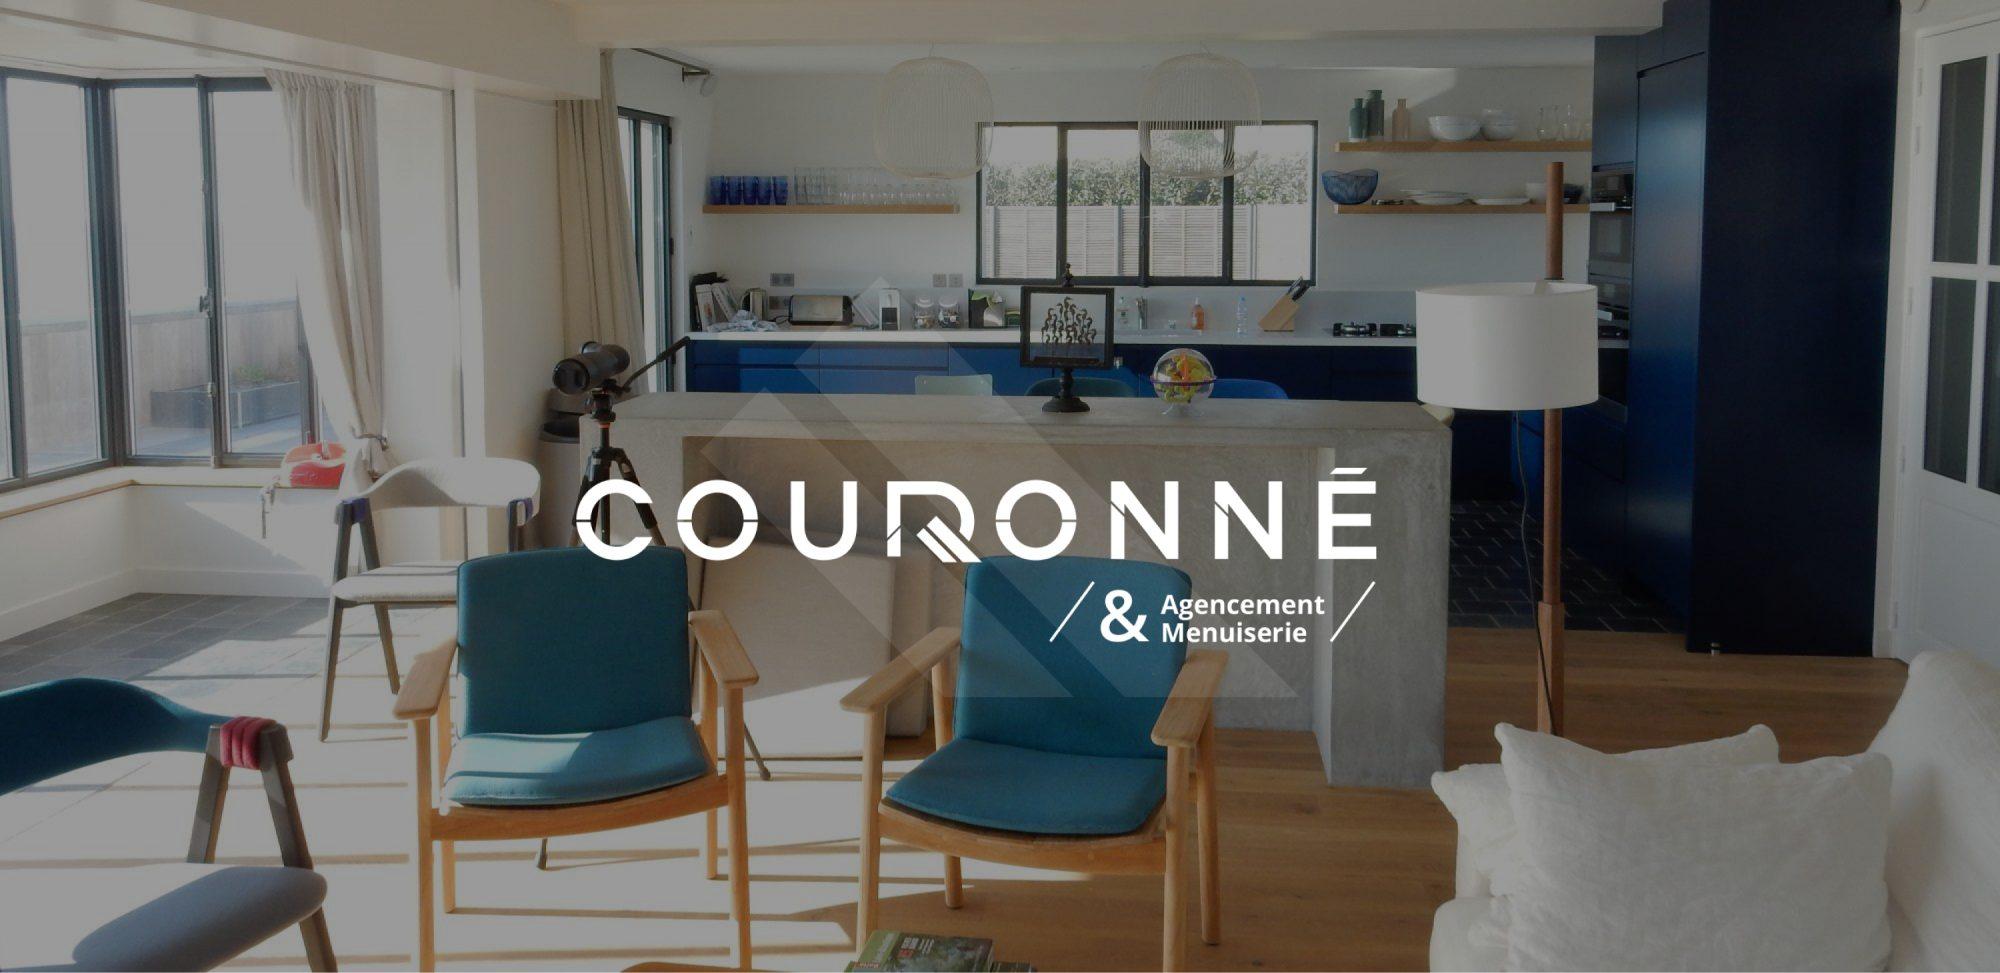 Couronné - Agencement & Menuiserie